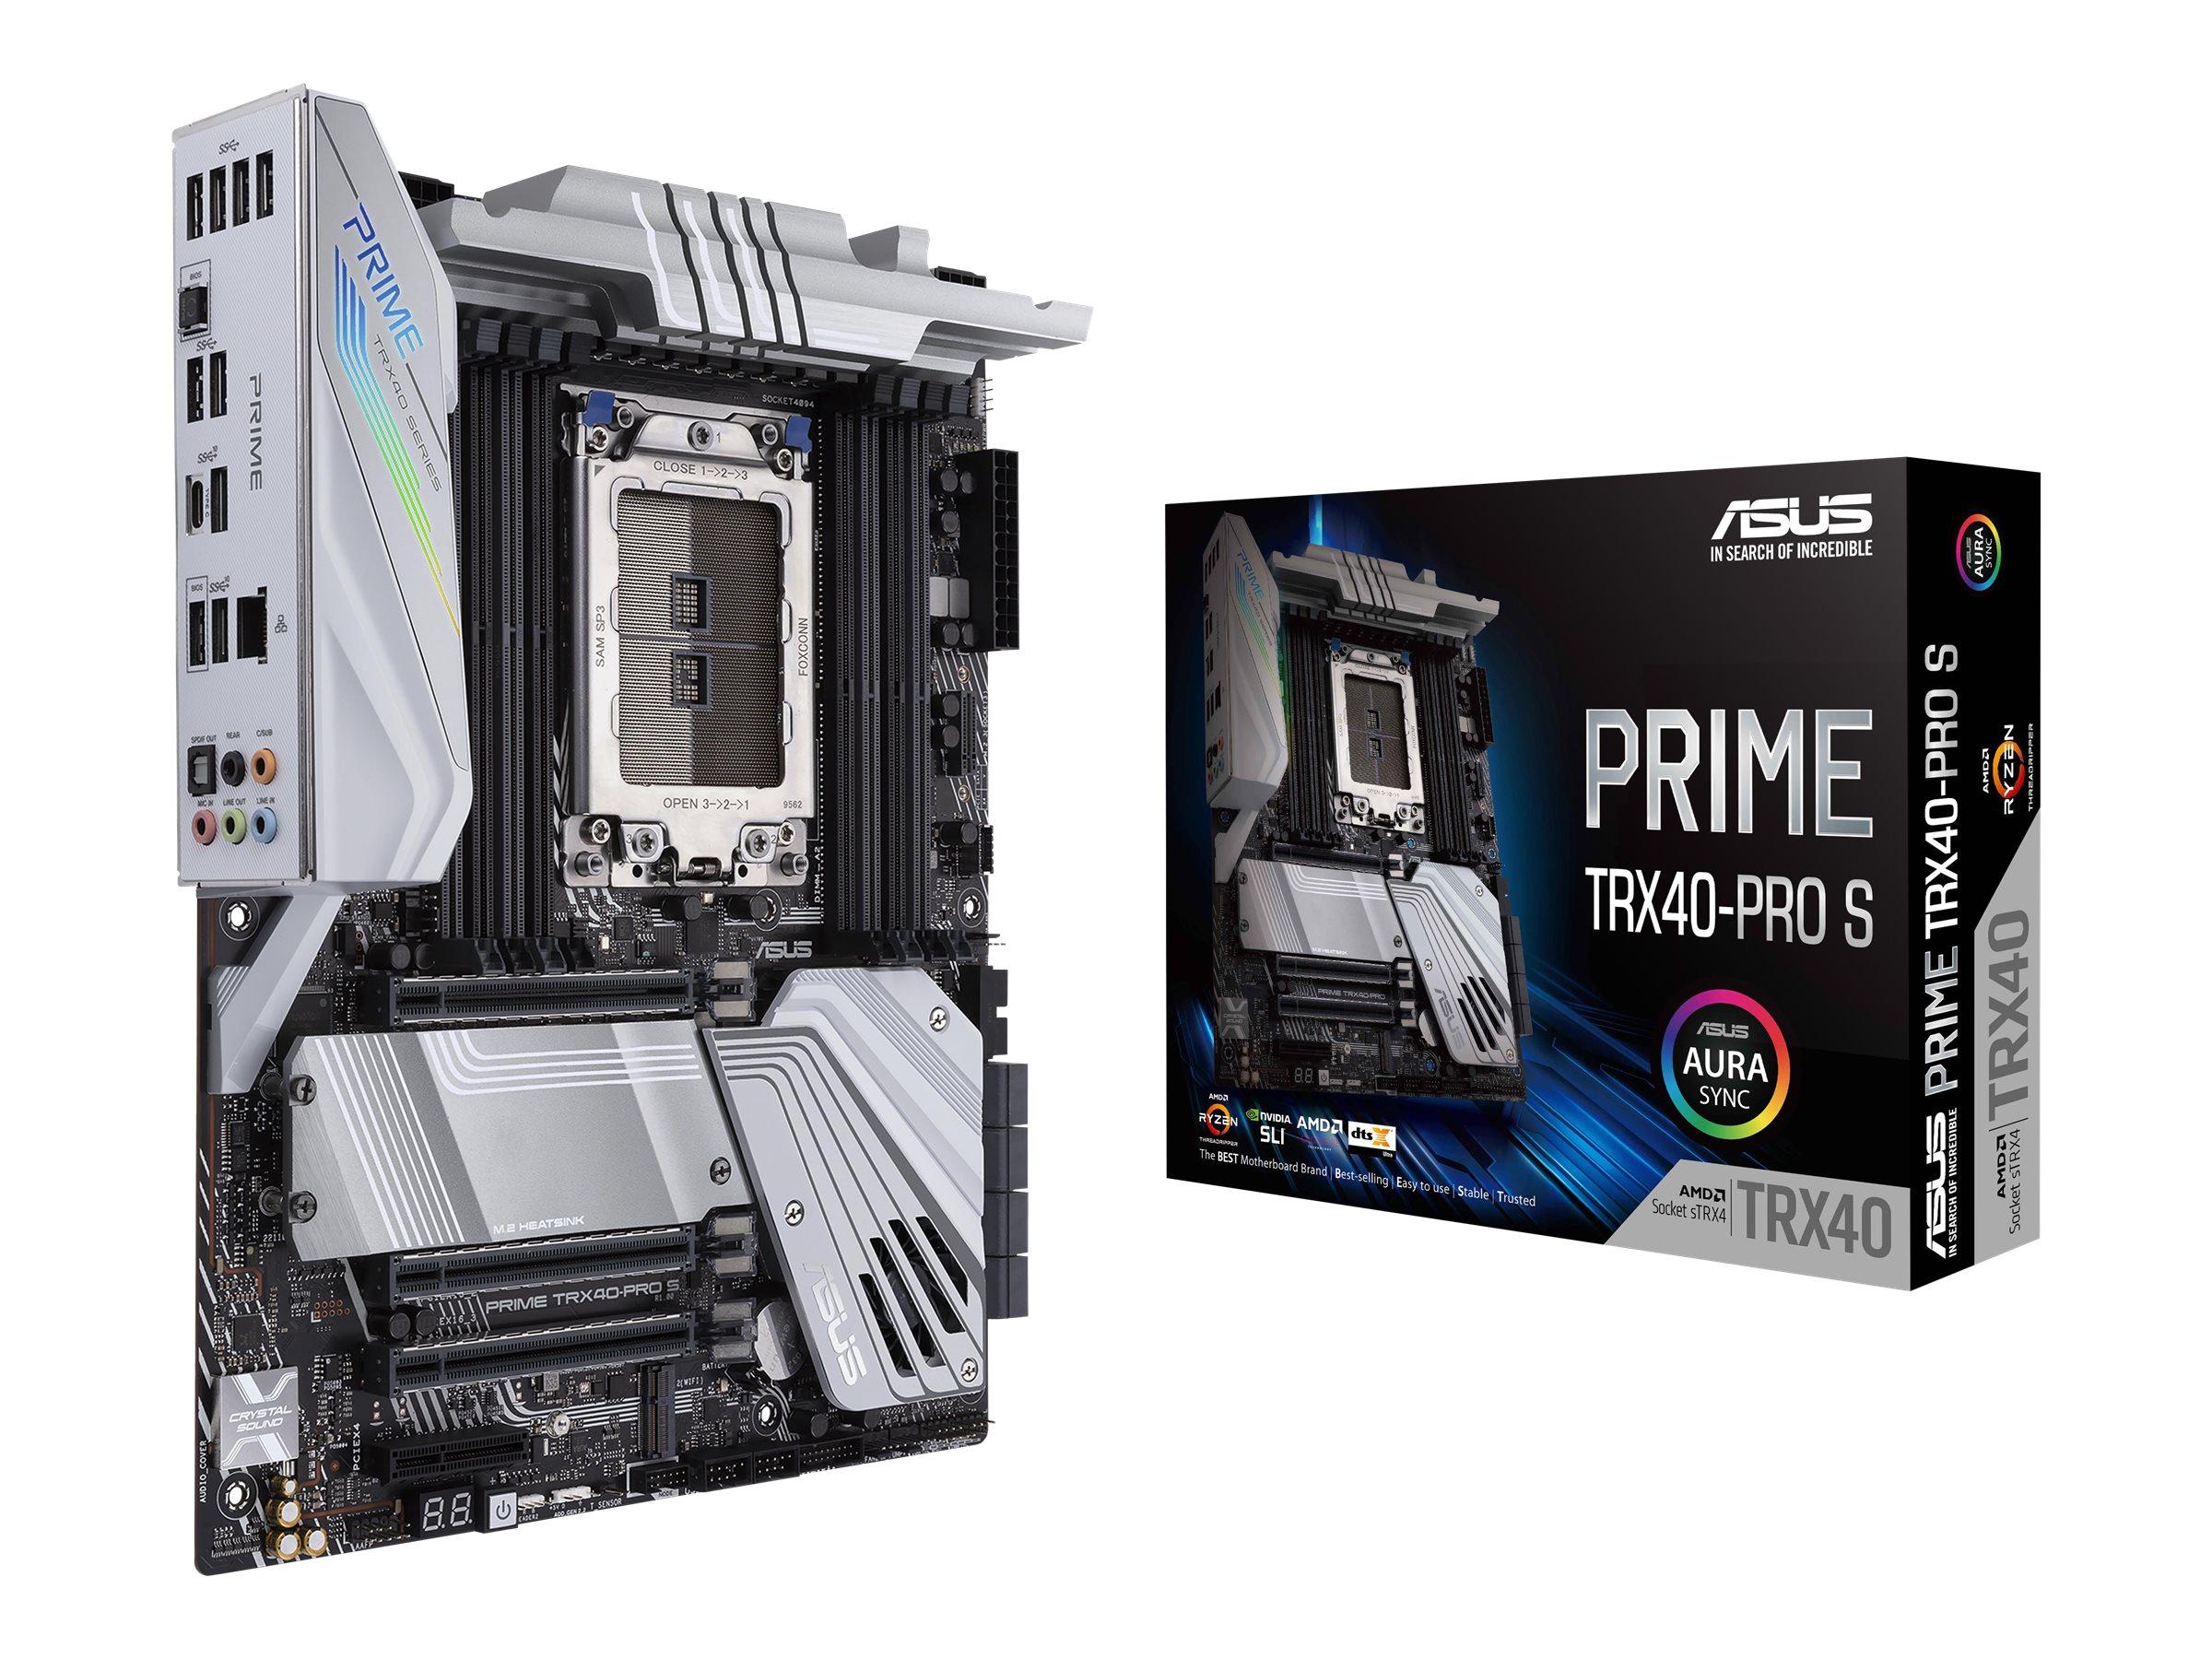 ASUS PRIME TRX40-PRO S - Motherboard - ATX - Socket sTRX4 - AMD TRX40 - USB-C Gen2, USB 3.2 Gen 1, USB 3.2 Gen 2 - Gigabit LAN - HD Audio (8-Kanal)